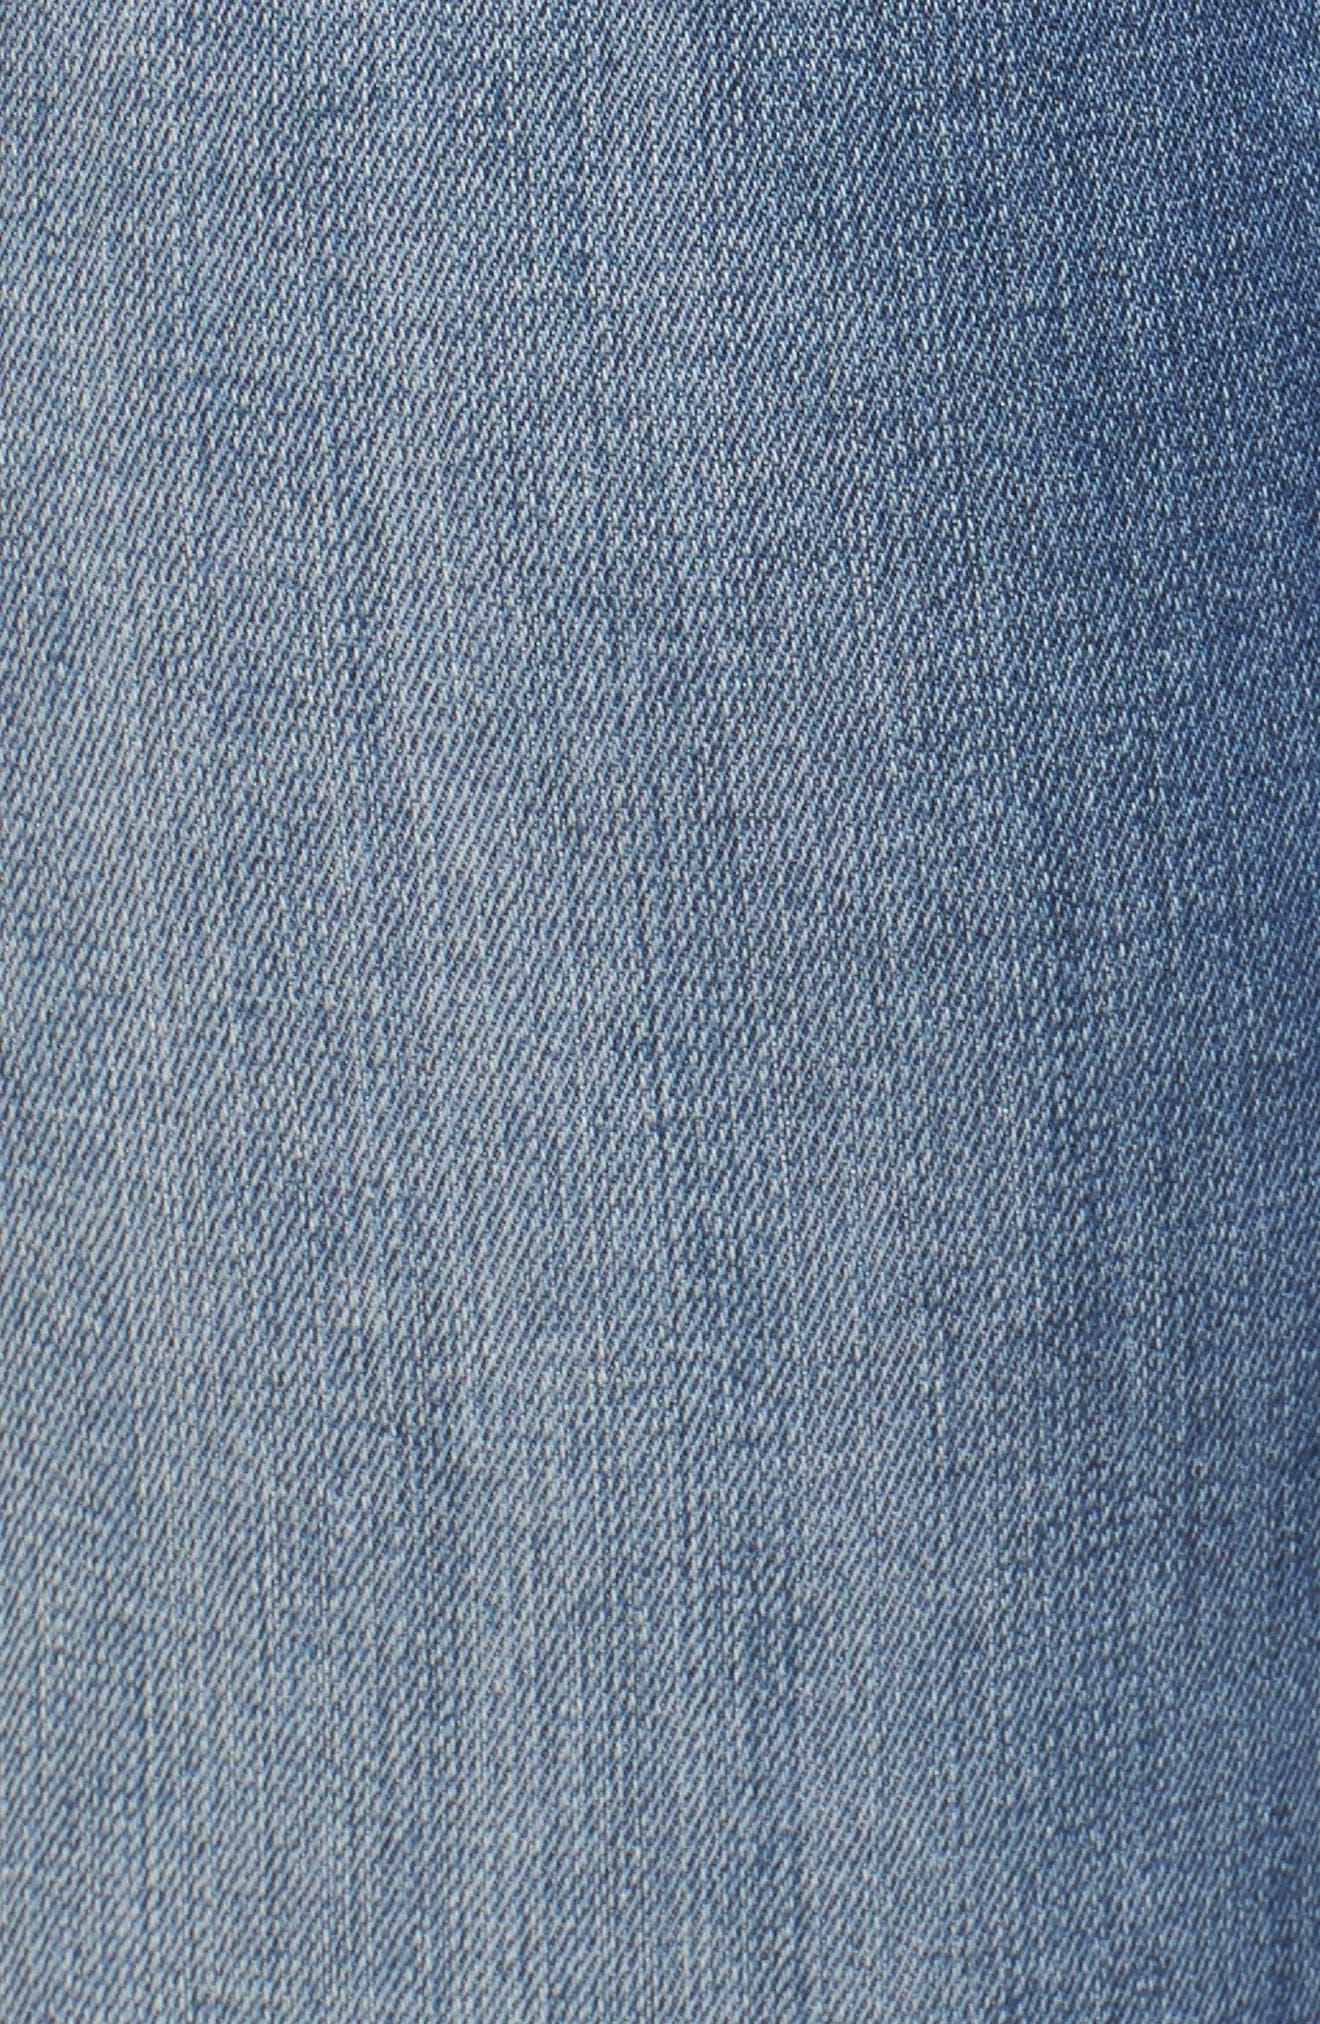 Alternate Image 5  - Melissa McCarthy Seven7 Cuffed Girlfriend Jeans (Boston) (Plus Size)